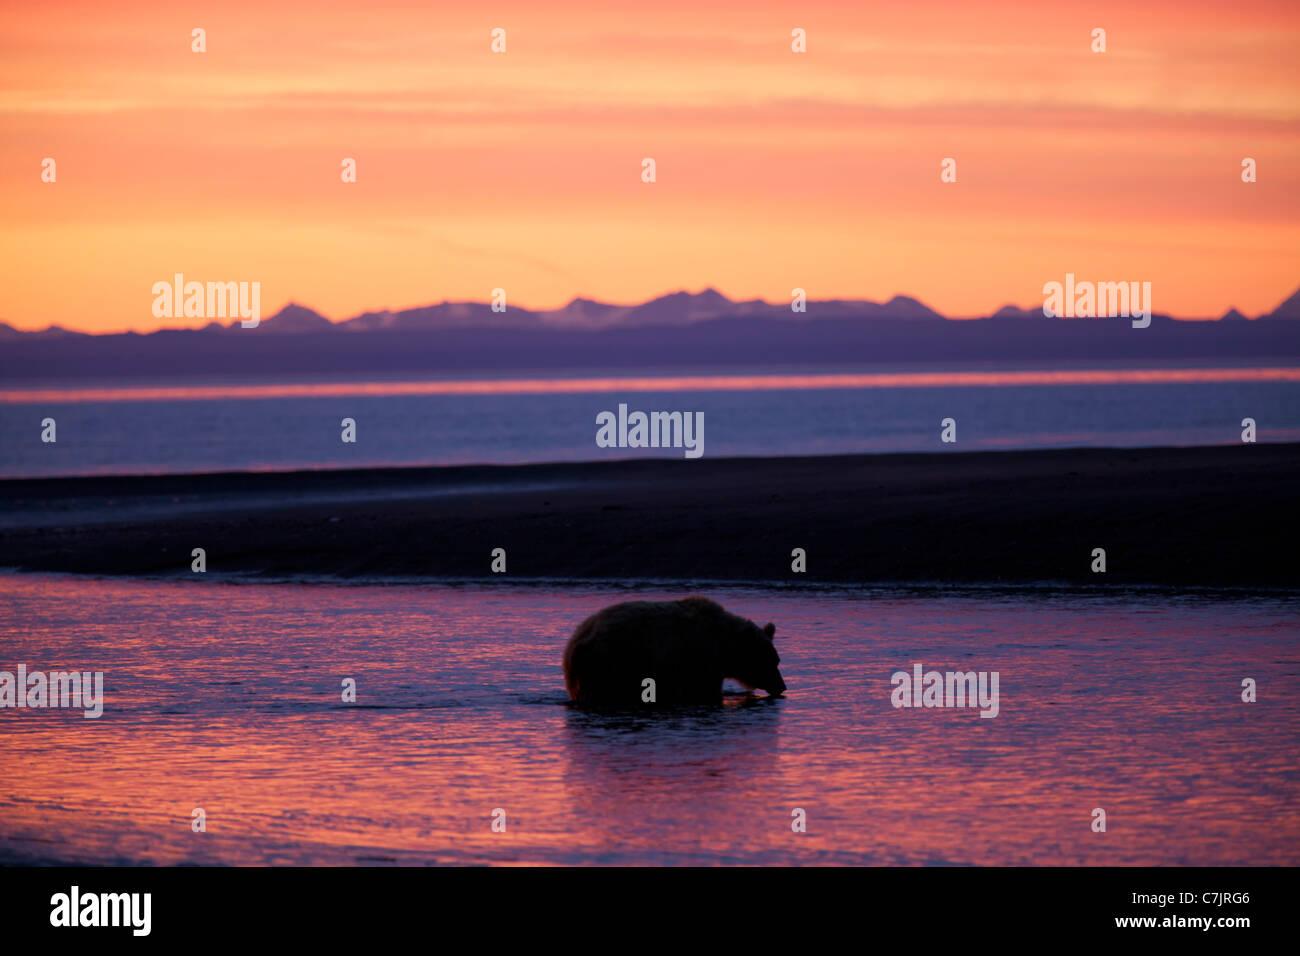 Marrón / Grizzly Bear, Lake Clark National Park, Alaska. Foto de stock